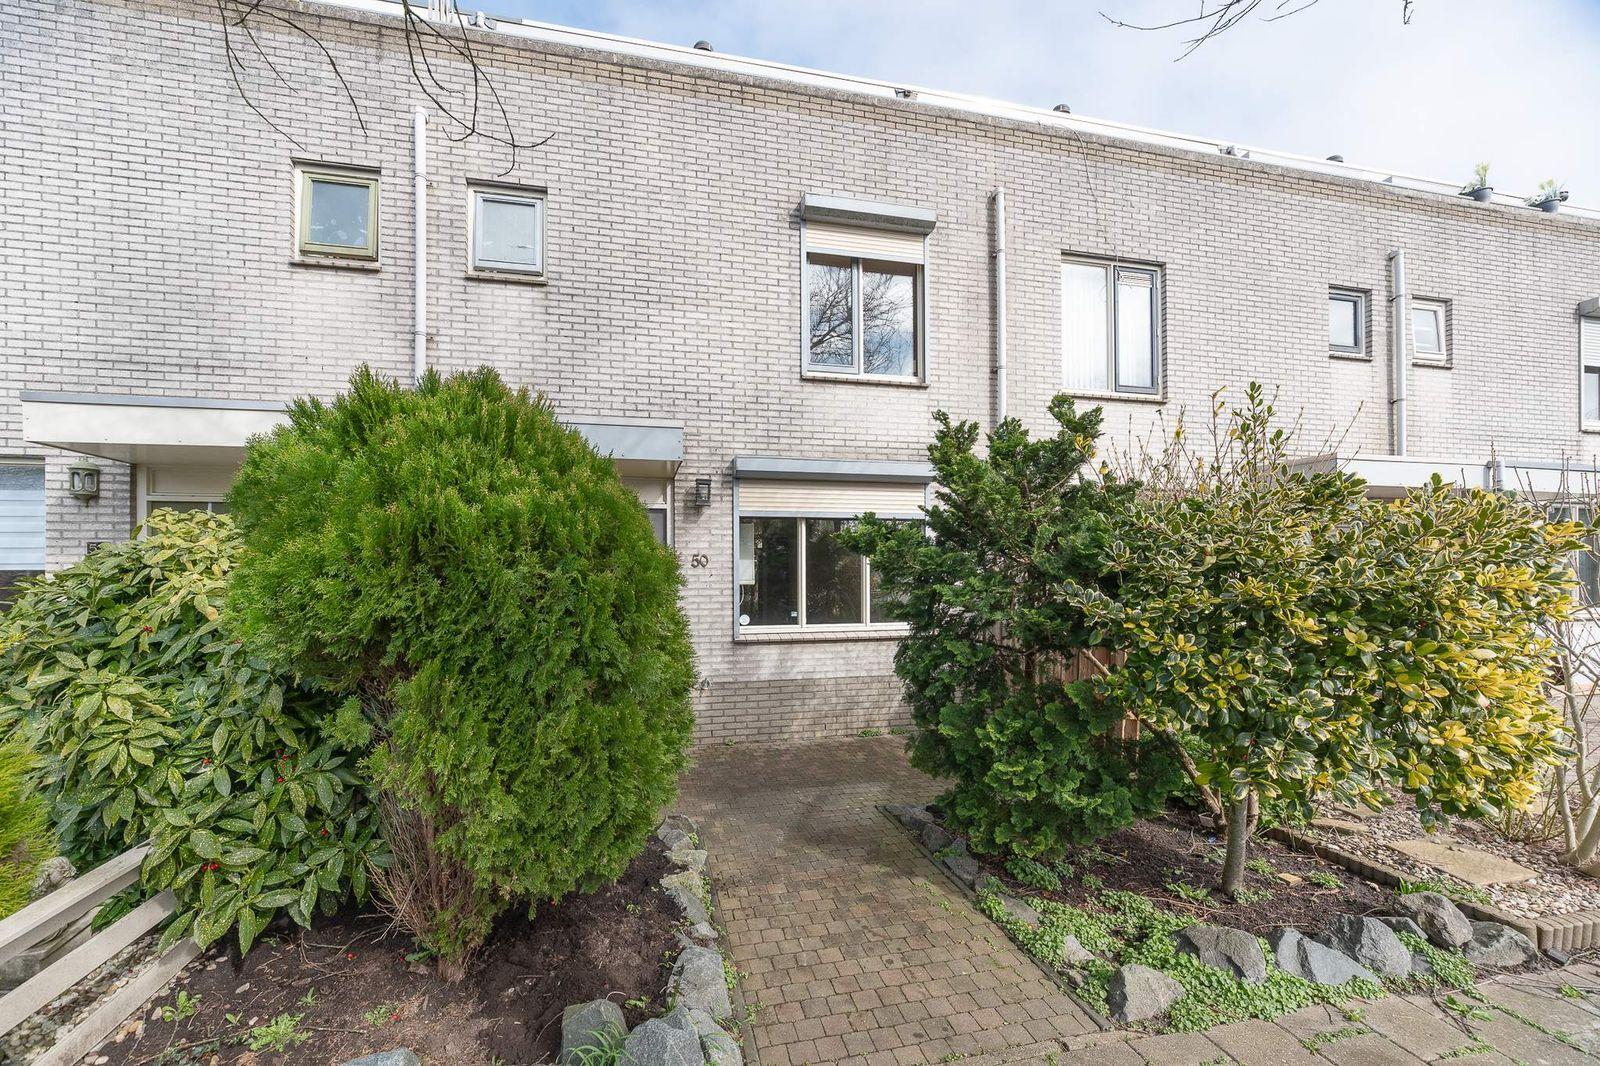 Markiezenhofstraat 50, Almere